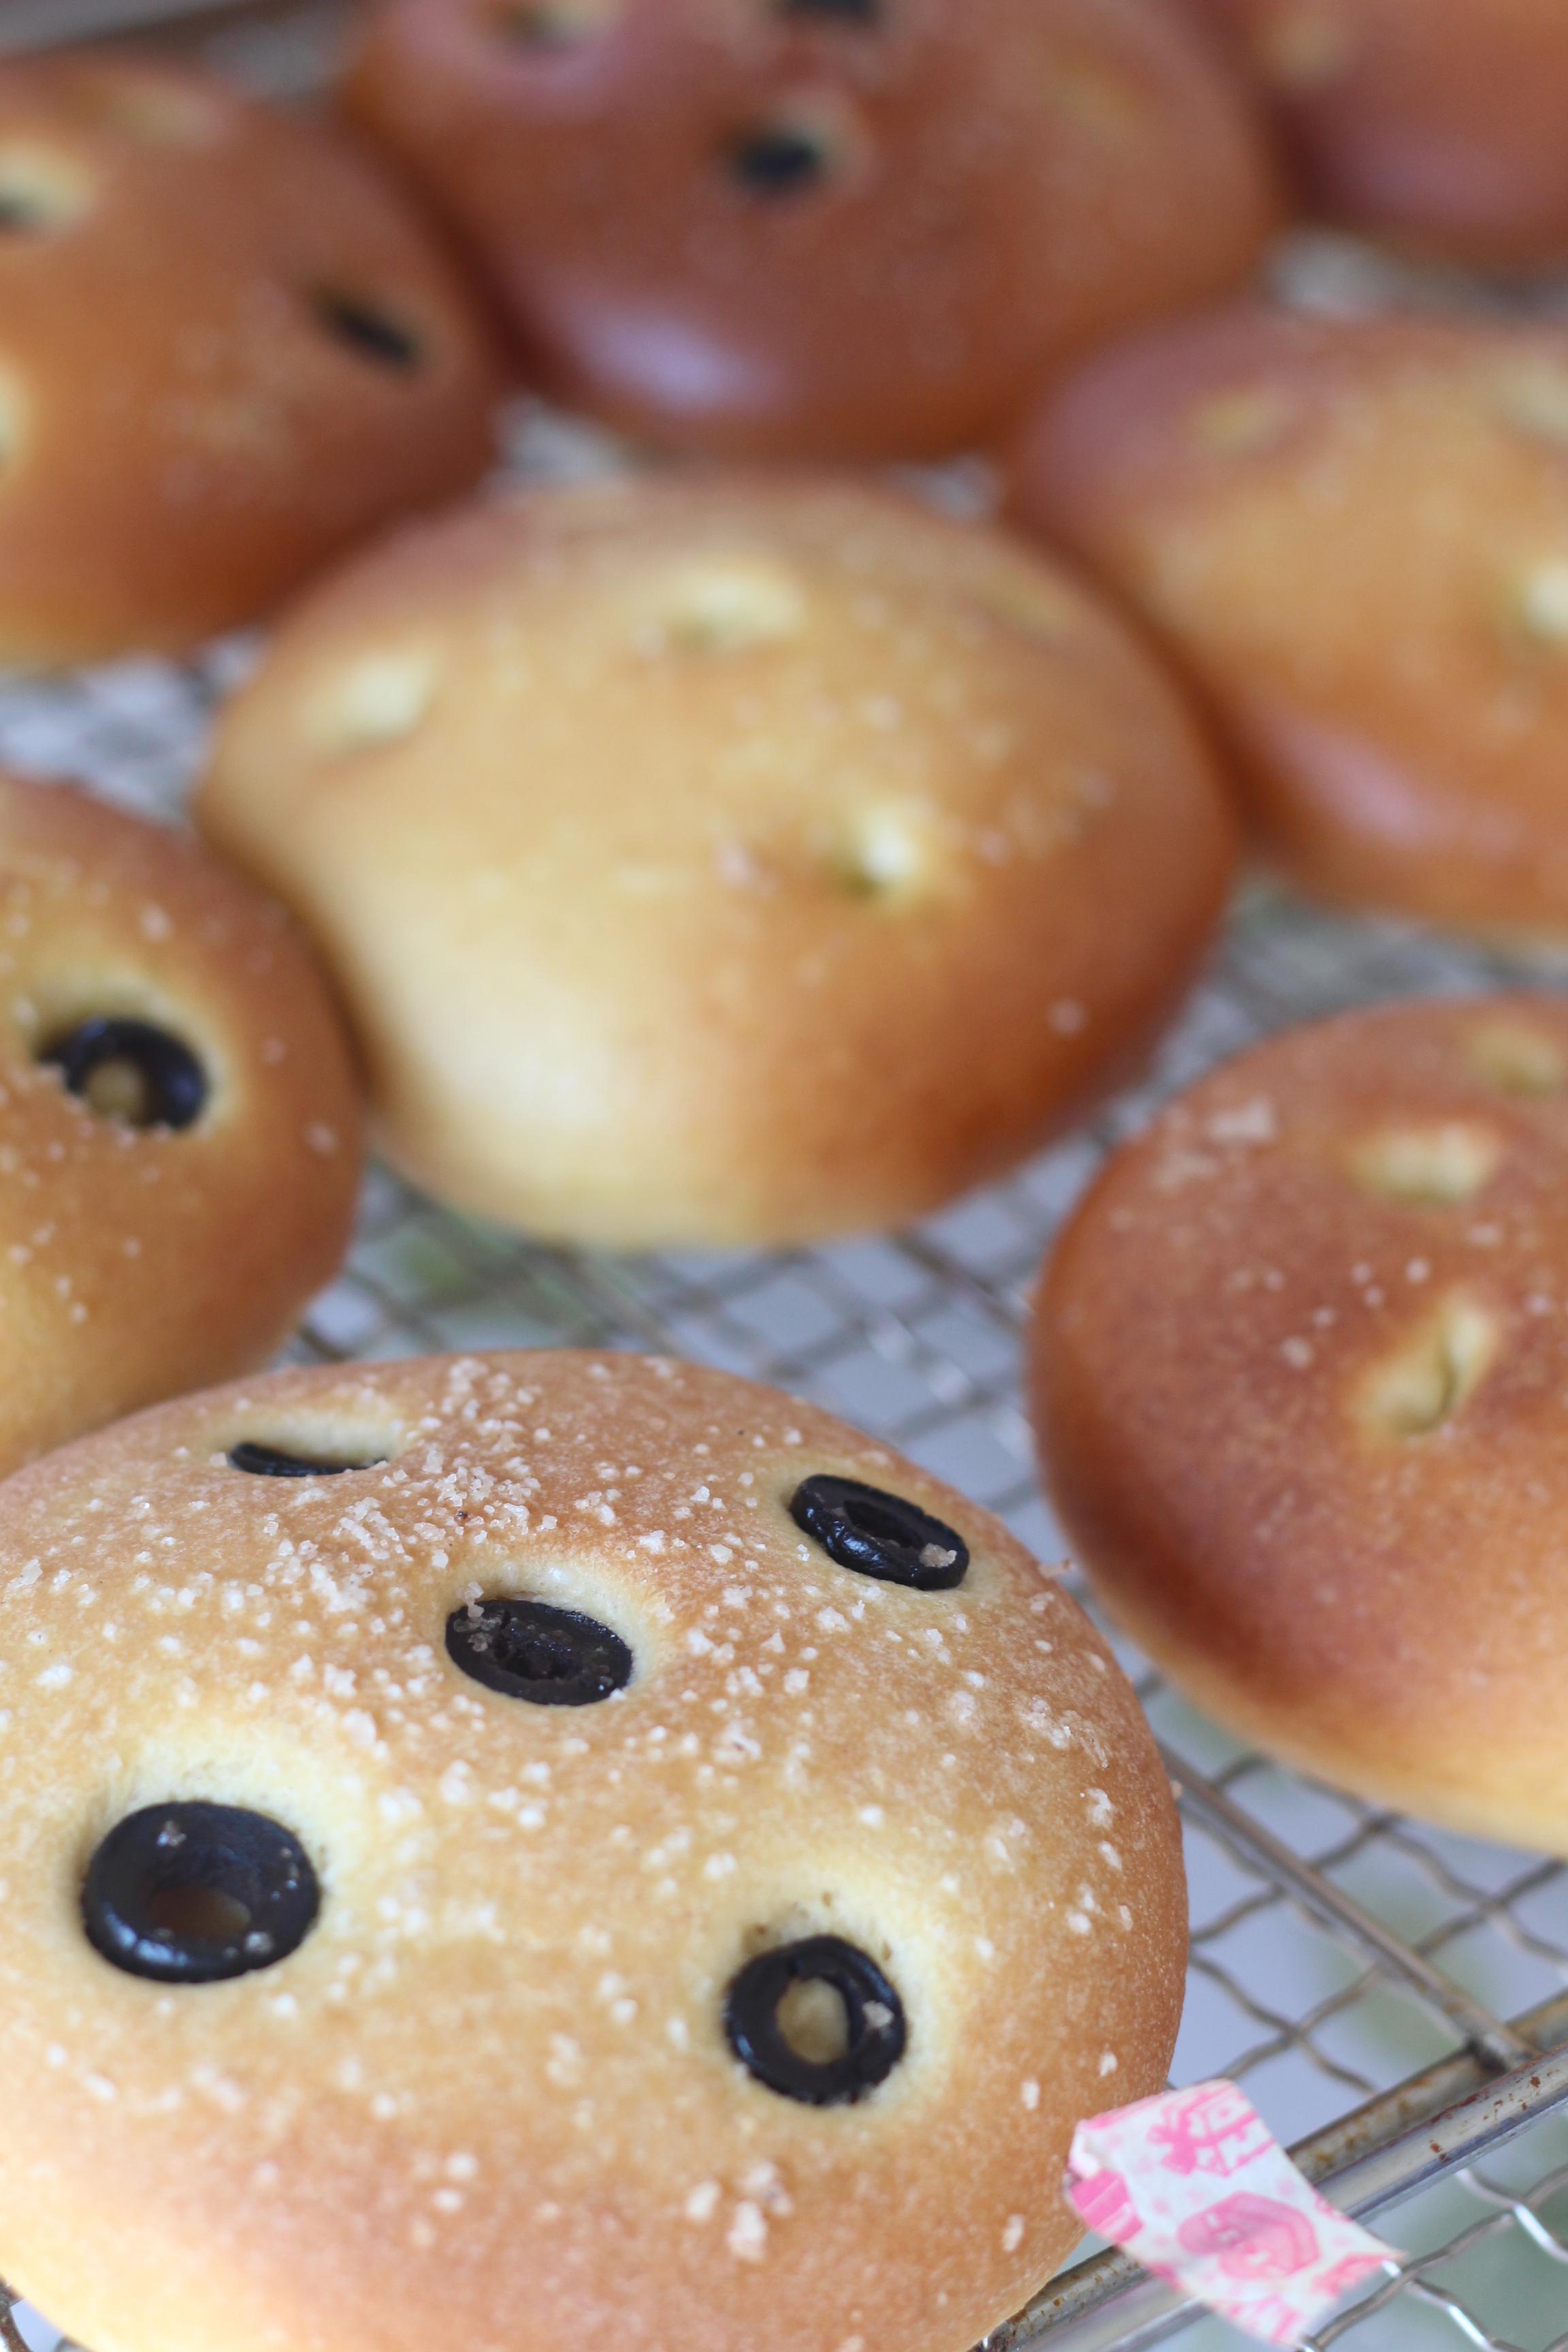 a-ta-sante糖質制限パン料理教室、京都江部粉糖質制限パンアドバンスコース『ミニクロワッサン&フォカッチャ』